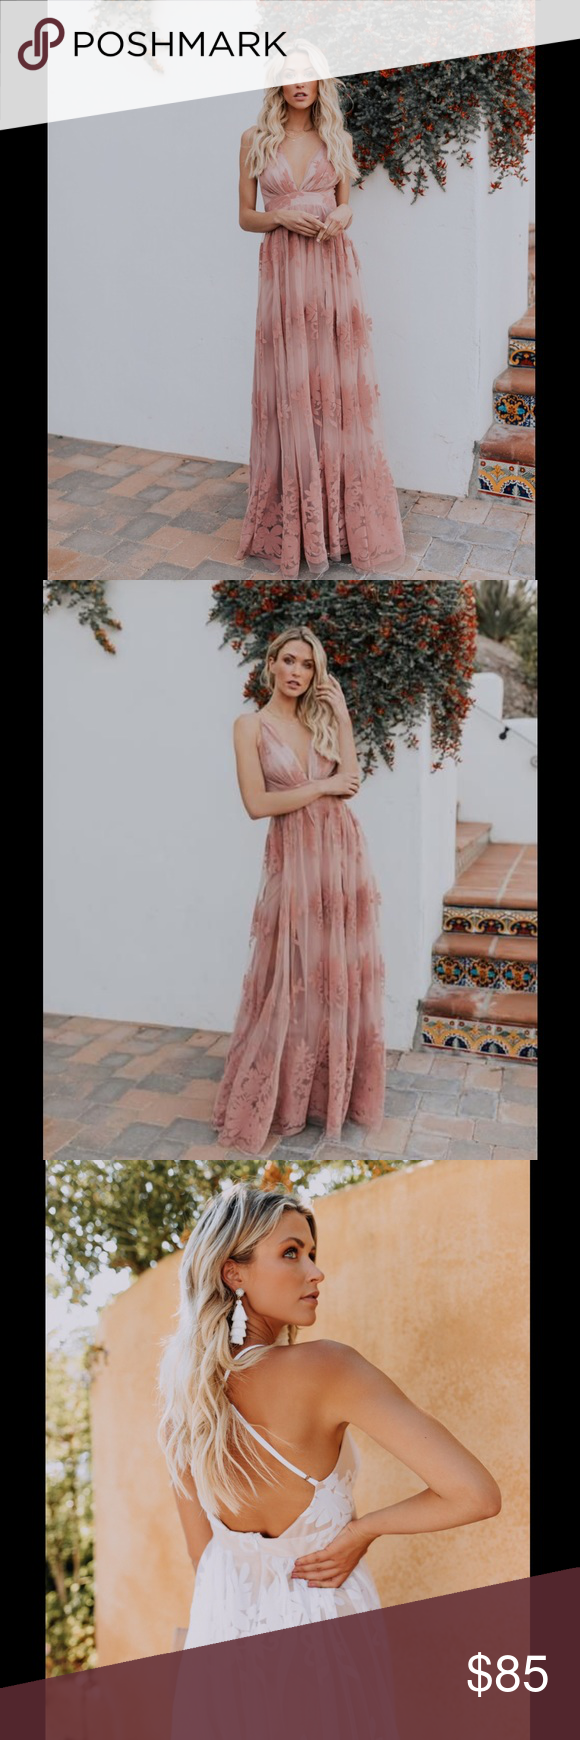 Vici Nwt Antonia Maxi Dress In Mauve Beautiful Maxi Dresses Dresses Maxi Dress [ 1740 x 580 Pixel ]